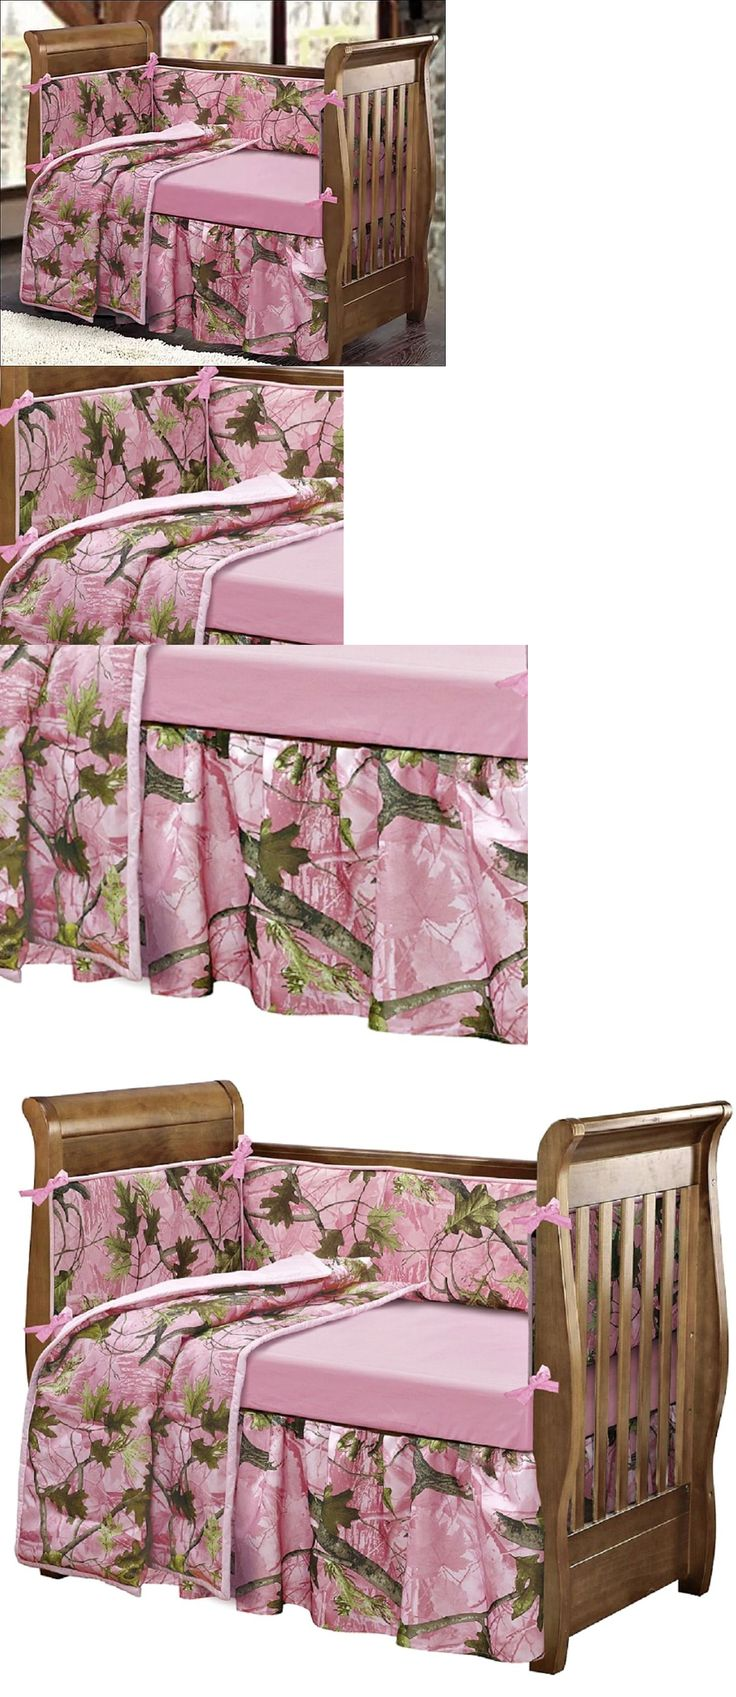 Owl crafts baby bedding nursery decor nursery crafts forward pink owl - Baby Kid Stuff Woodsy Crib Bedding Pink Camo Girl Nursery Baby Decor Gift Infant Bedroom